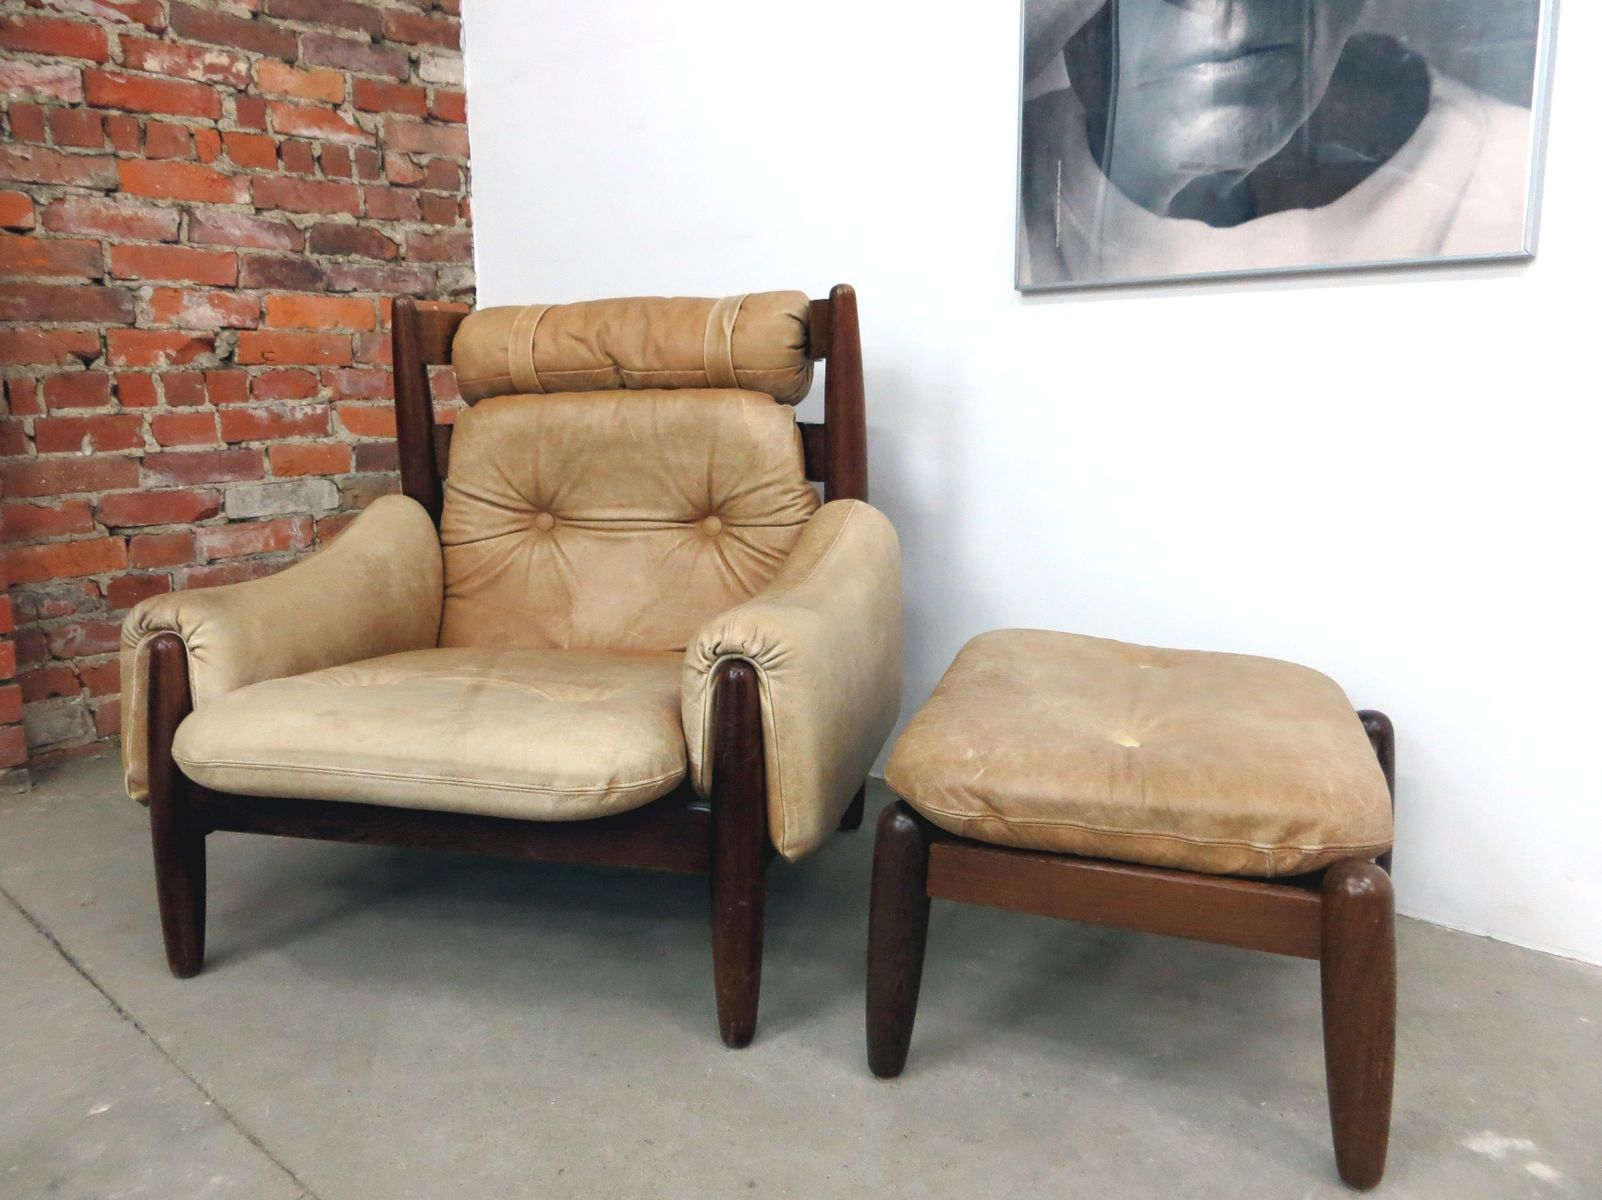 brazilian leather lounge chair and ottoman s for sale at pamono - brazilian leather lounge chair and ottoman s